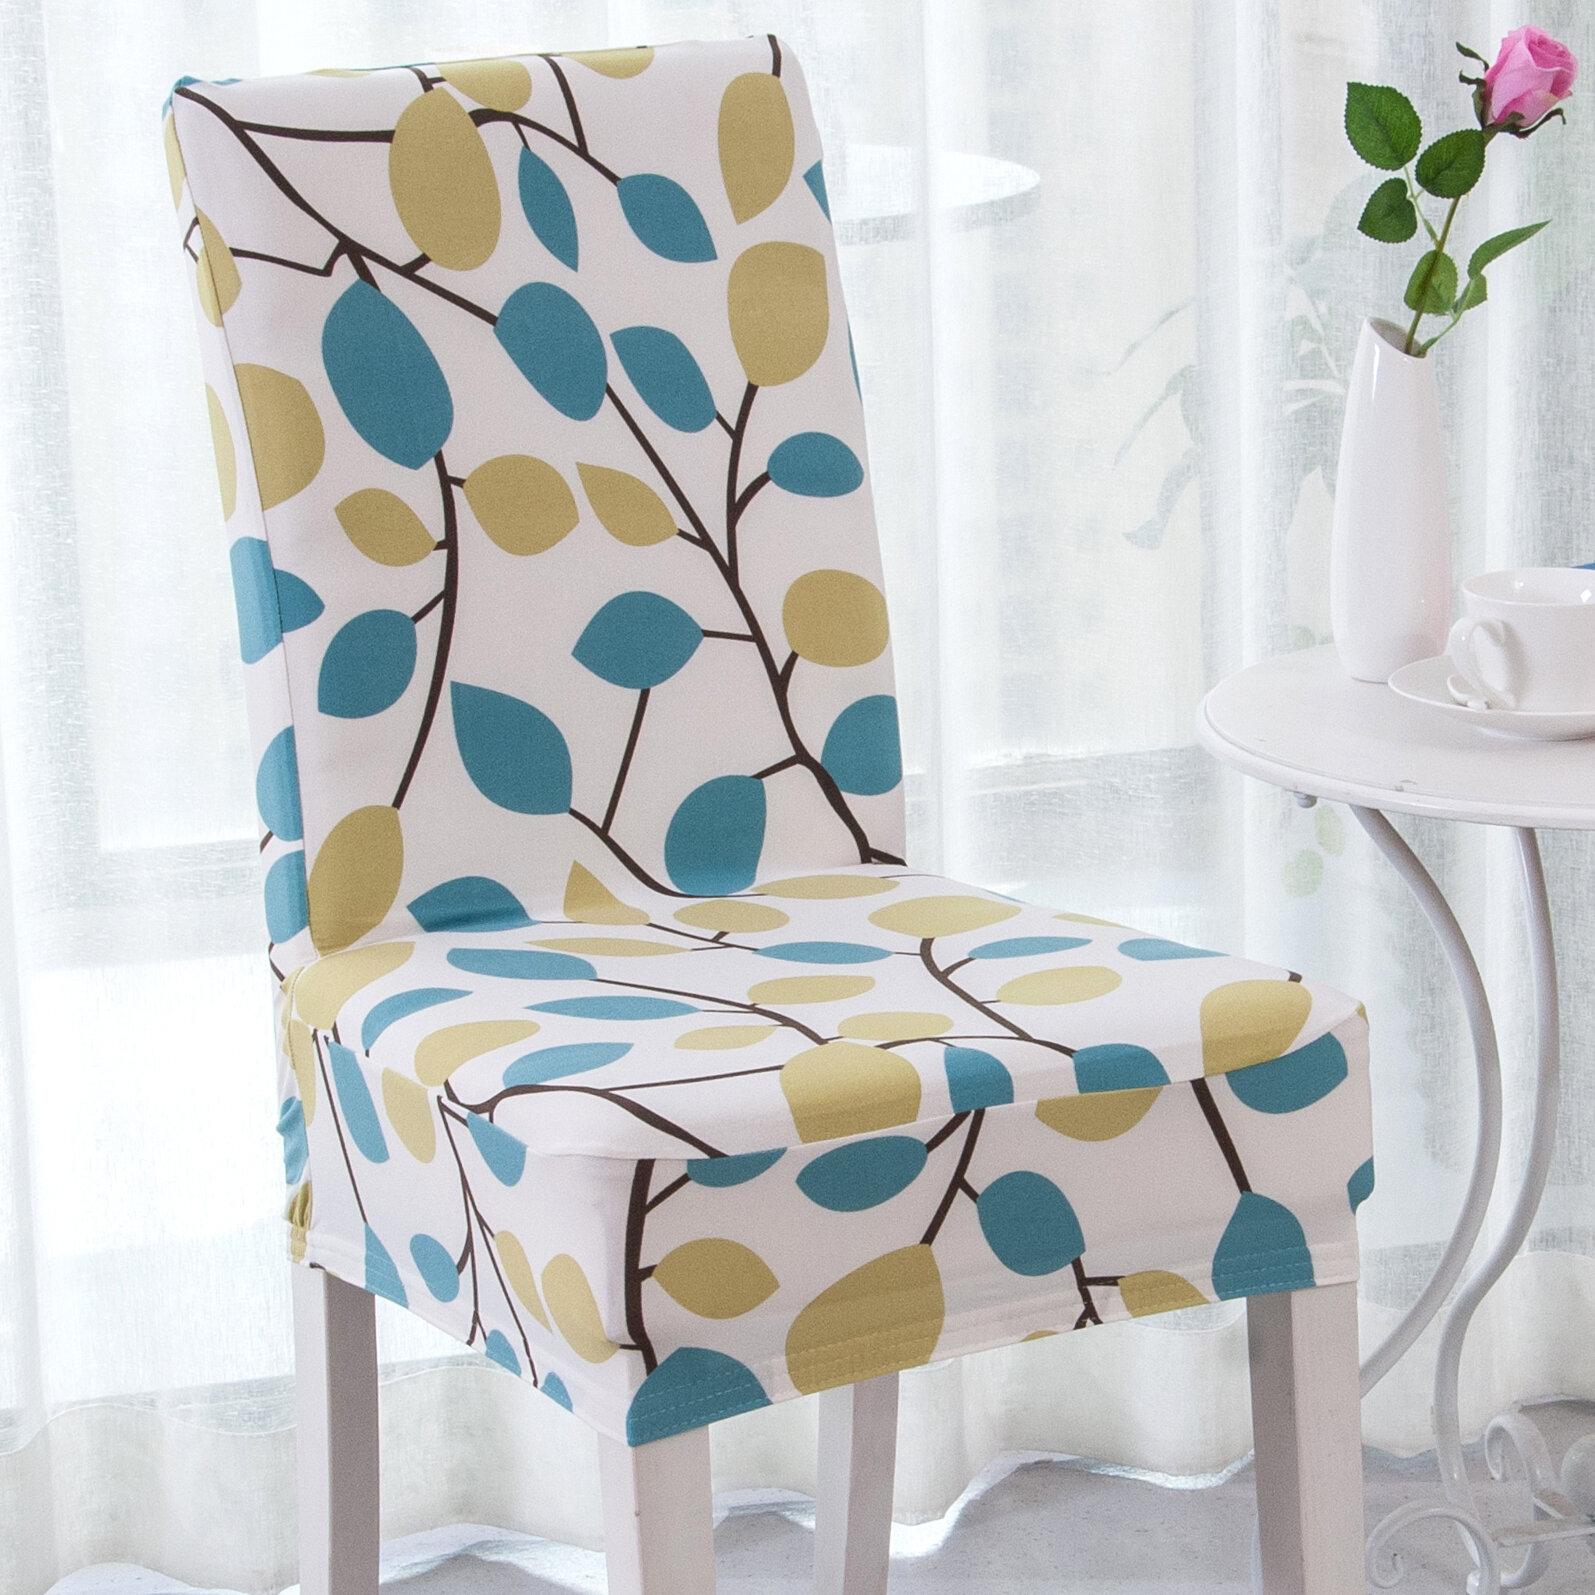 Ebern Designs Elegant Box Cushion Dining Chair Slipcover Reviews